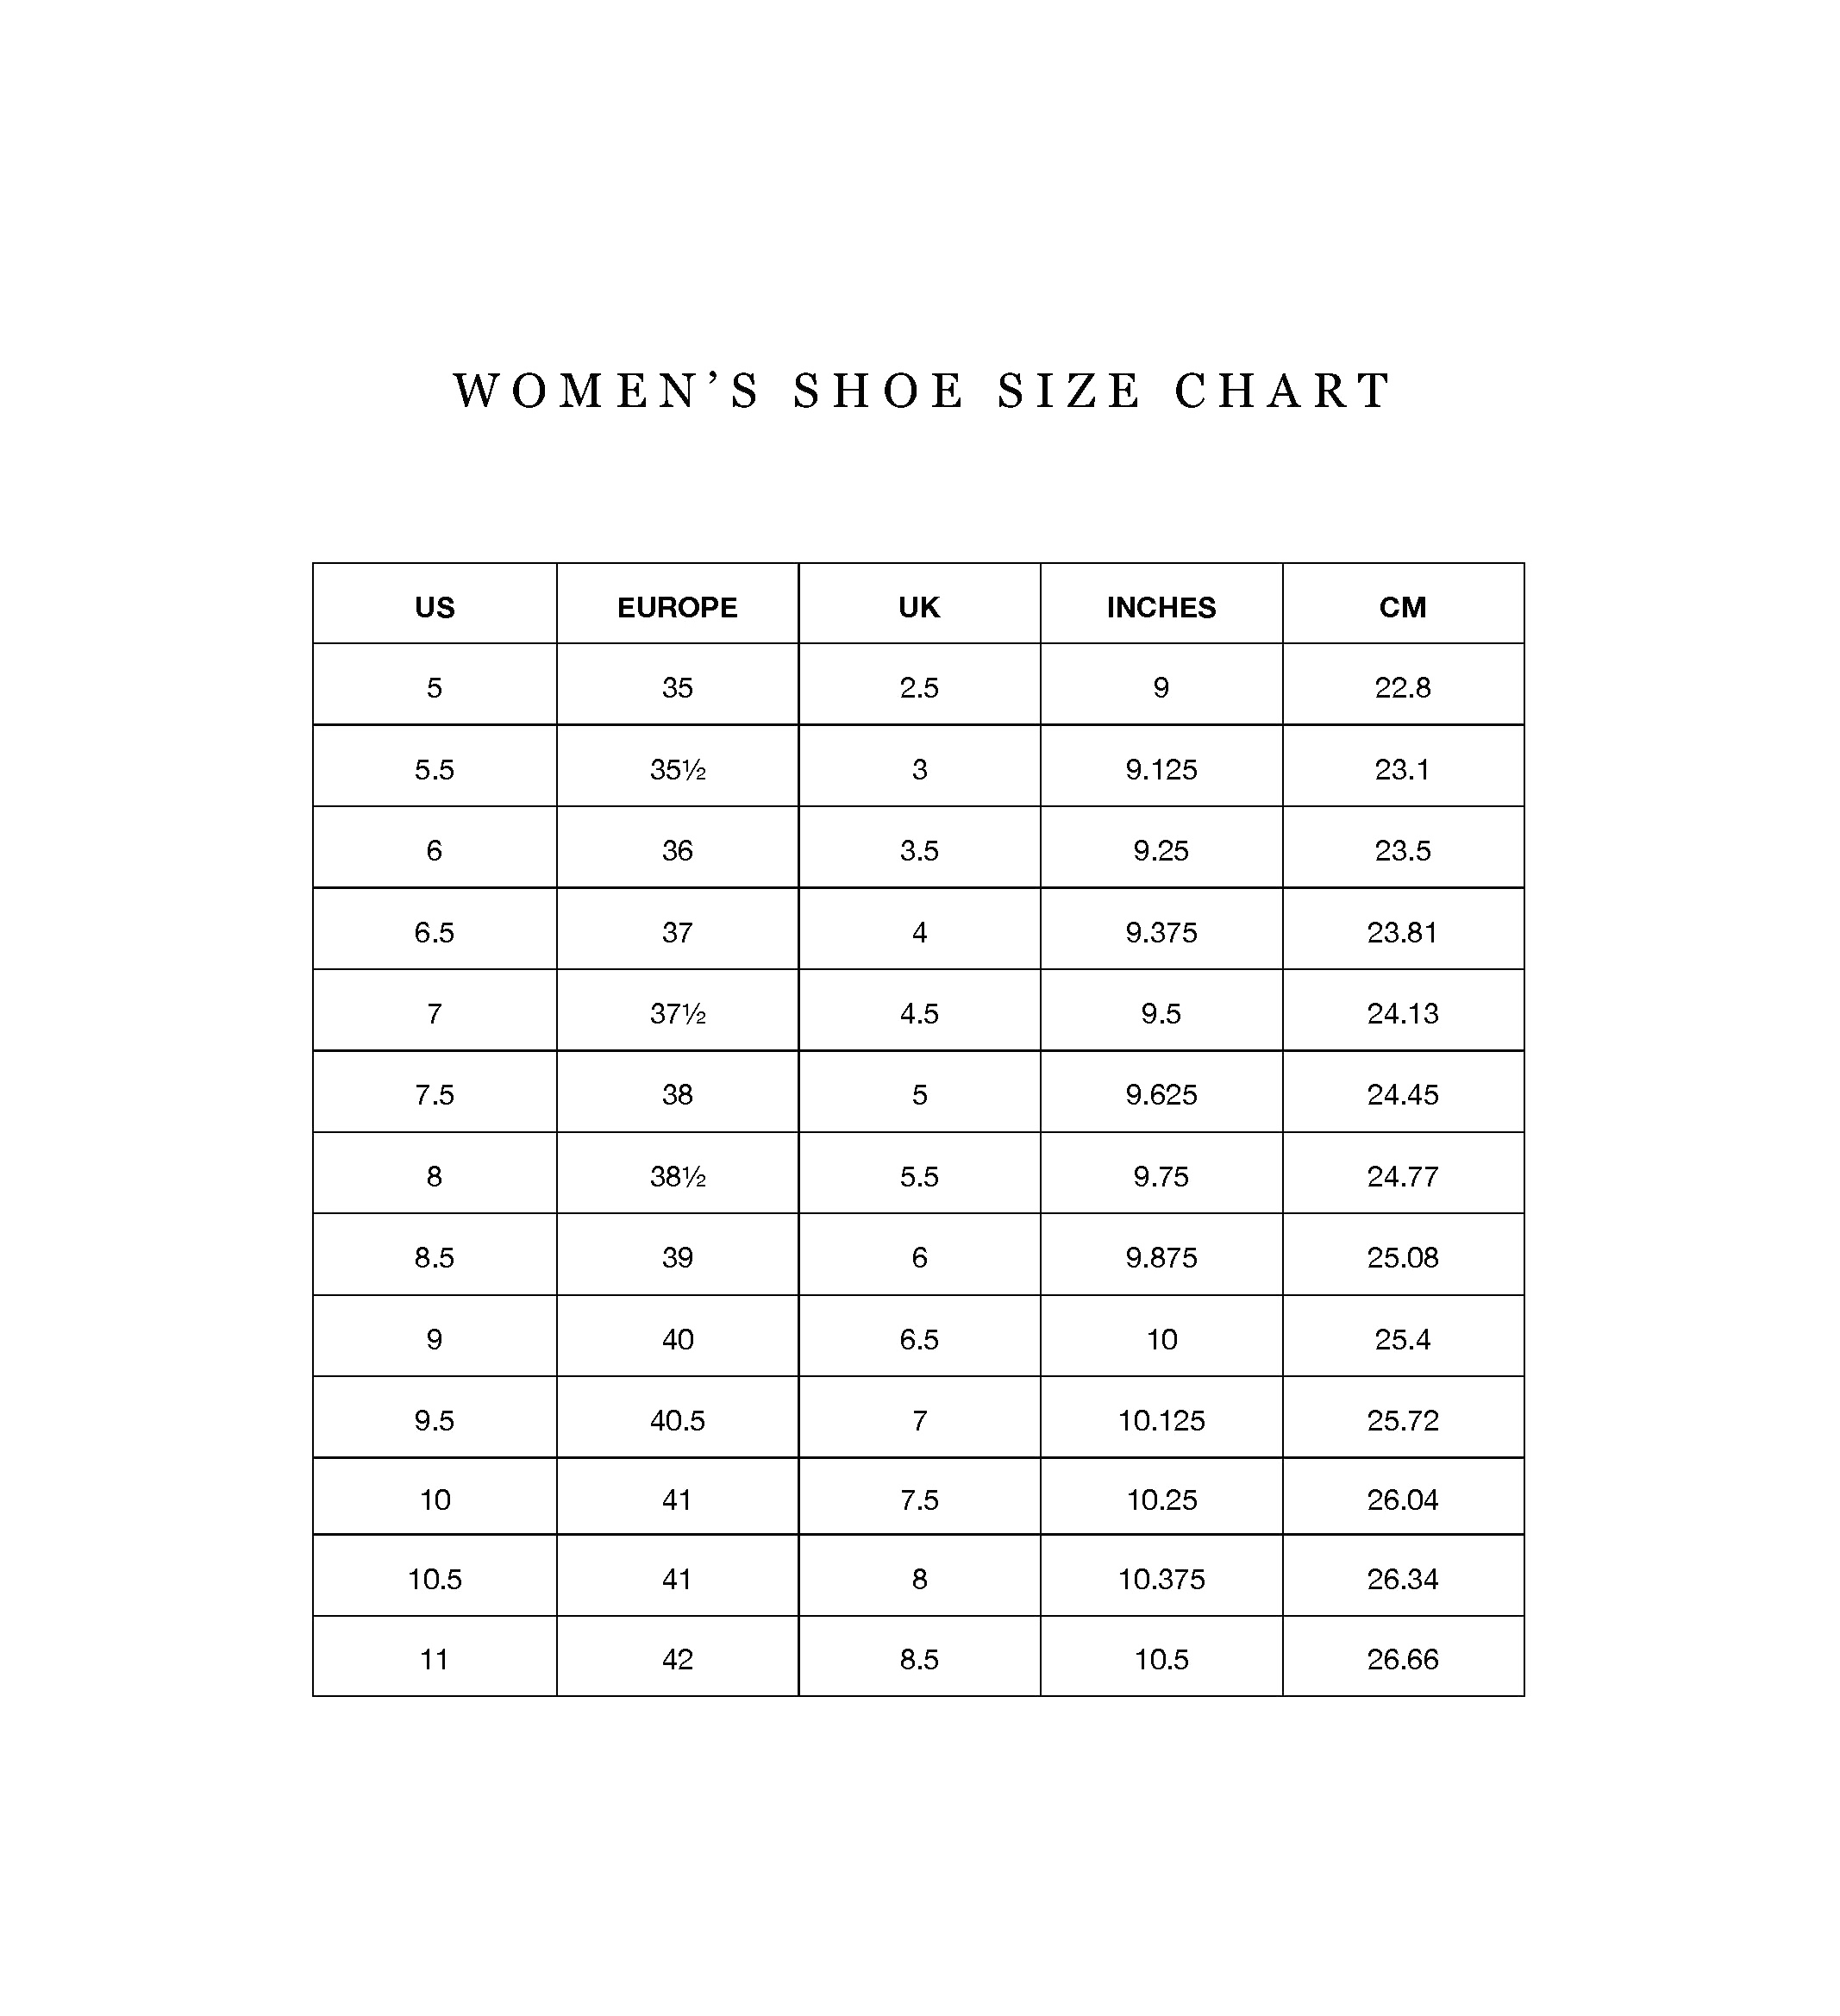 SHOE-SIZE-CHART.png